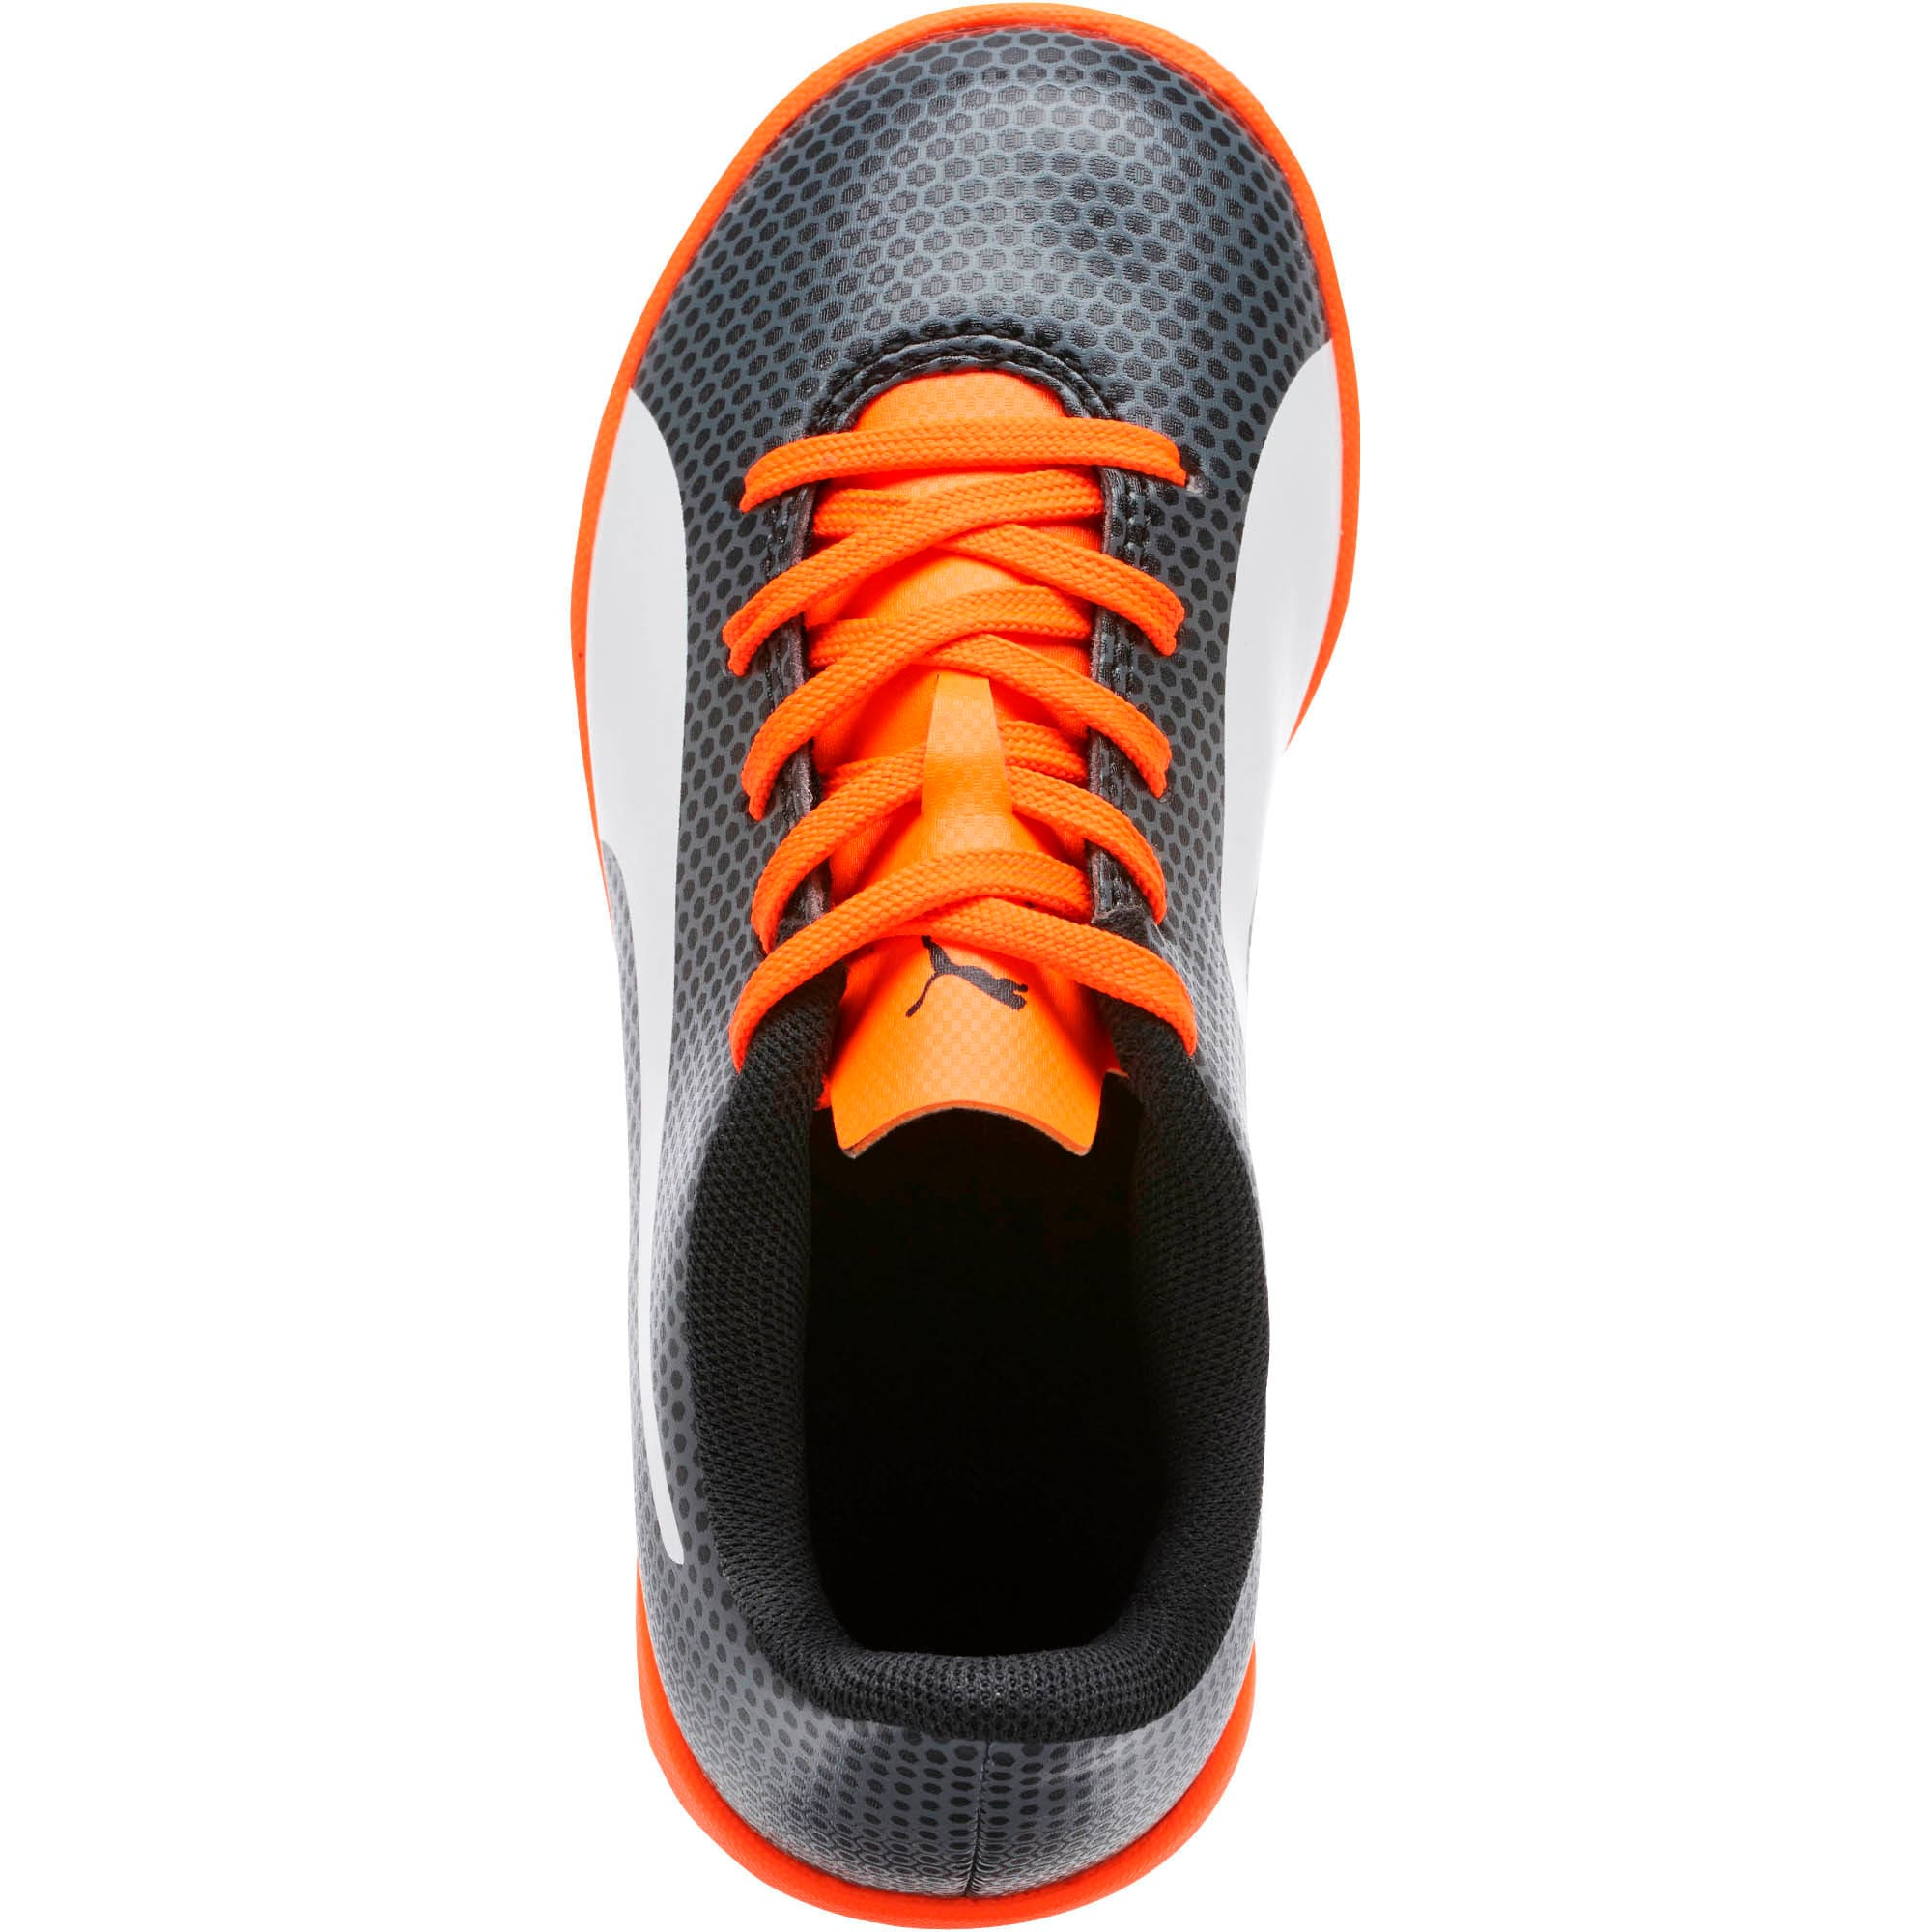 Thumbnail 5 of PUMA Spirit IT Soccer Shoes JR, Black-White-Orange, medium